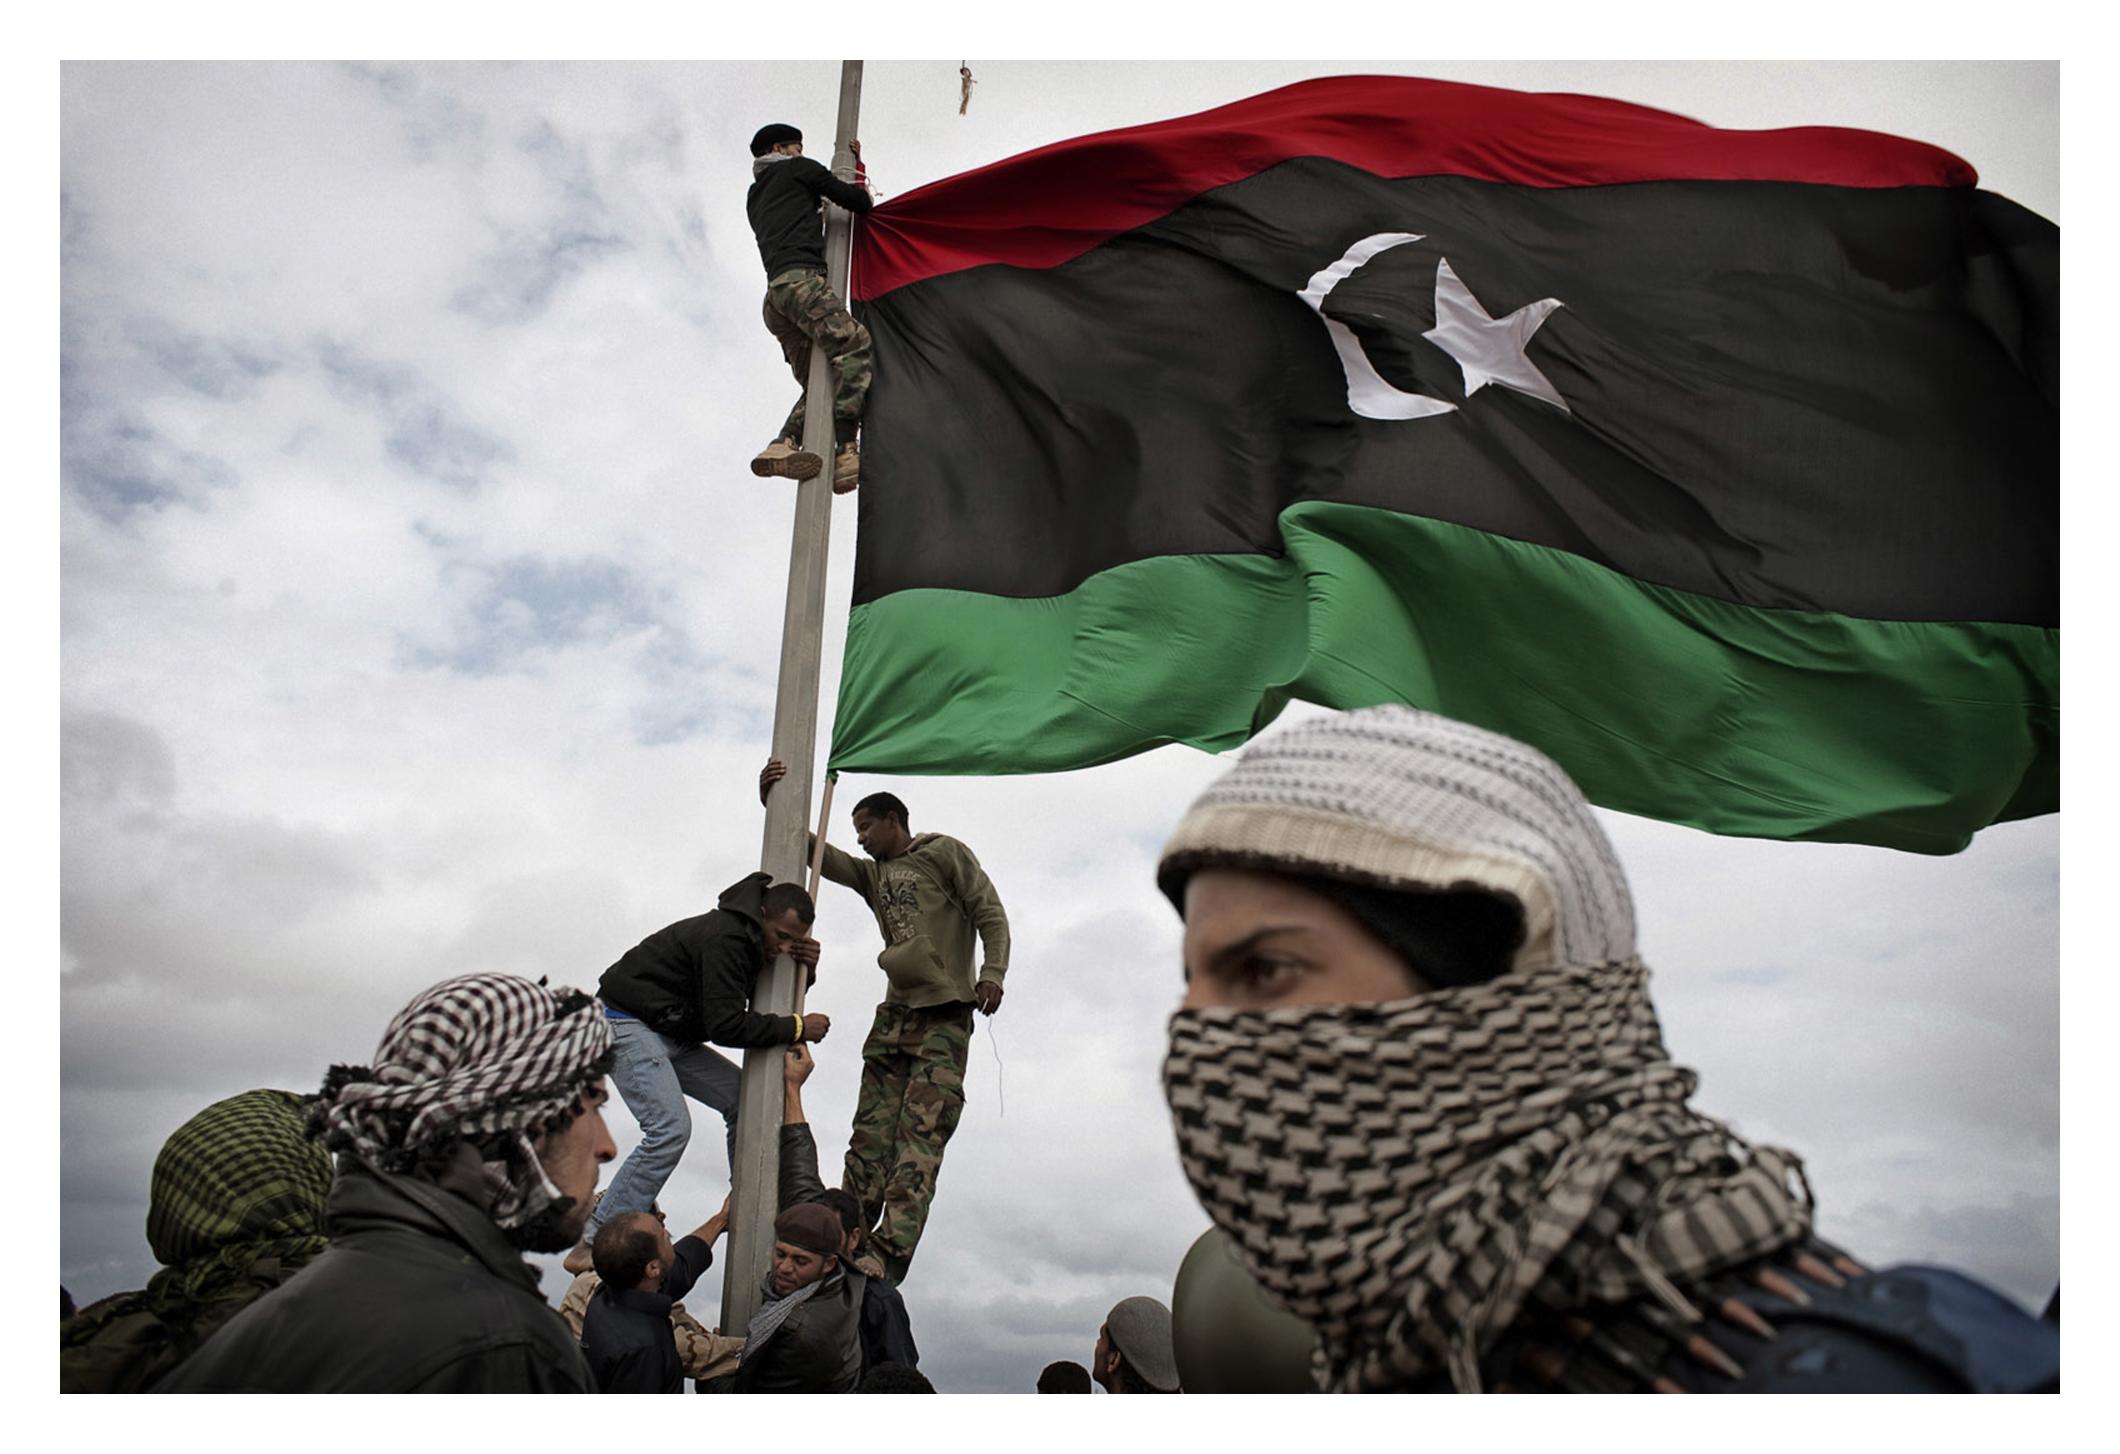 RAS LANUF, LIBYA - MARCH 08 2011: Libyan rebels raise their flag at a checkpoint in Ras Lanuf RAS LANUF, LIBYA - MARCH 08: Libyan rebels raise their flag at a checkpoint in Ras Lanuf